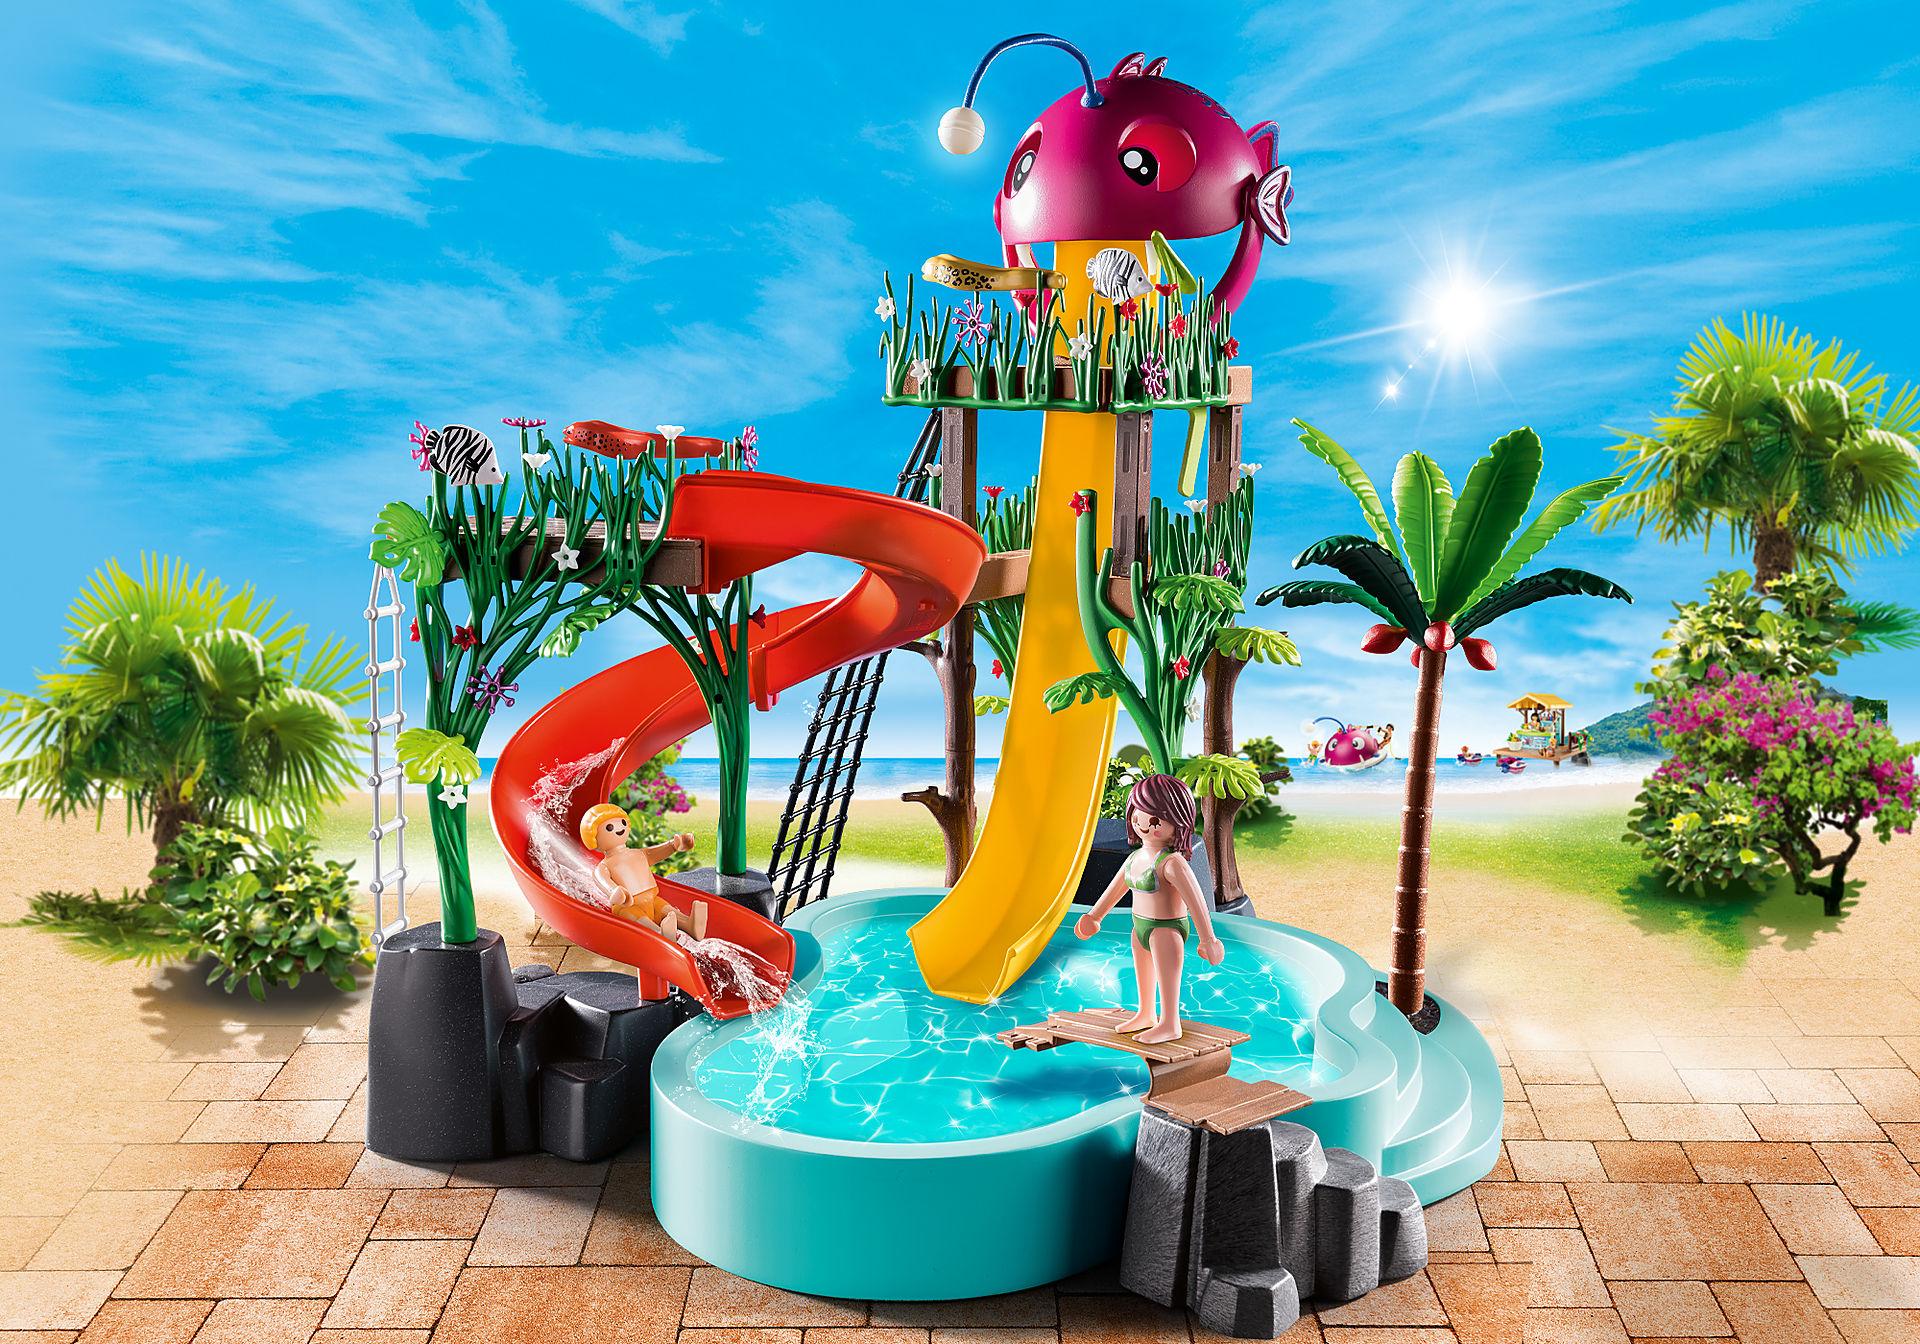 70609 Aqua Park med rutschkanor zoom image1